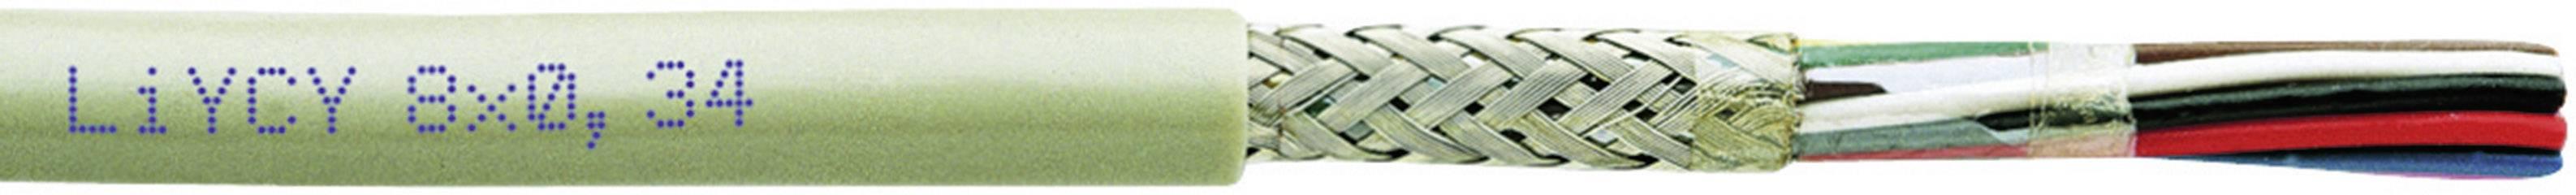 Riadiaci kábel Faber Kabel LiYCY 030393, 8 x 0.50 mm², vonkajší Ø 9.40 mm, 250 V, metrový tovar, sivá